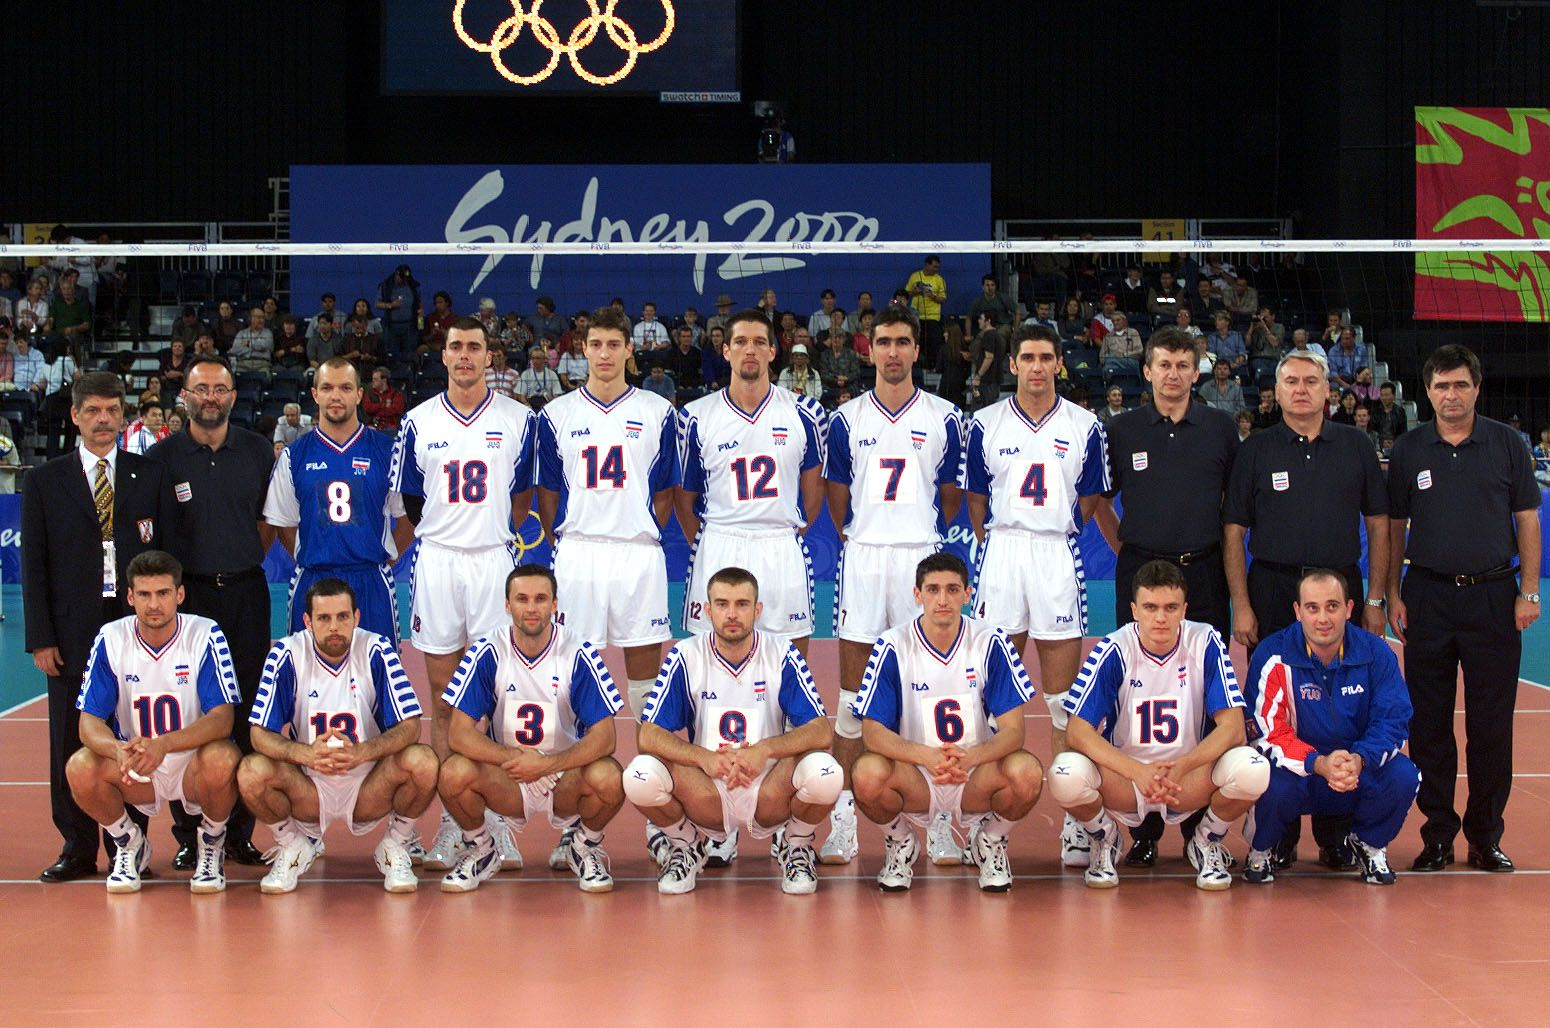 Reprezentacija Jugoslavije Na Olimpijskim Igrama U Sidneju 2000 Godine Senior Men Of Yugoslavia At The 2000 Olympics Olympic Games How To Memorize Things